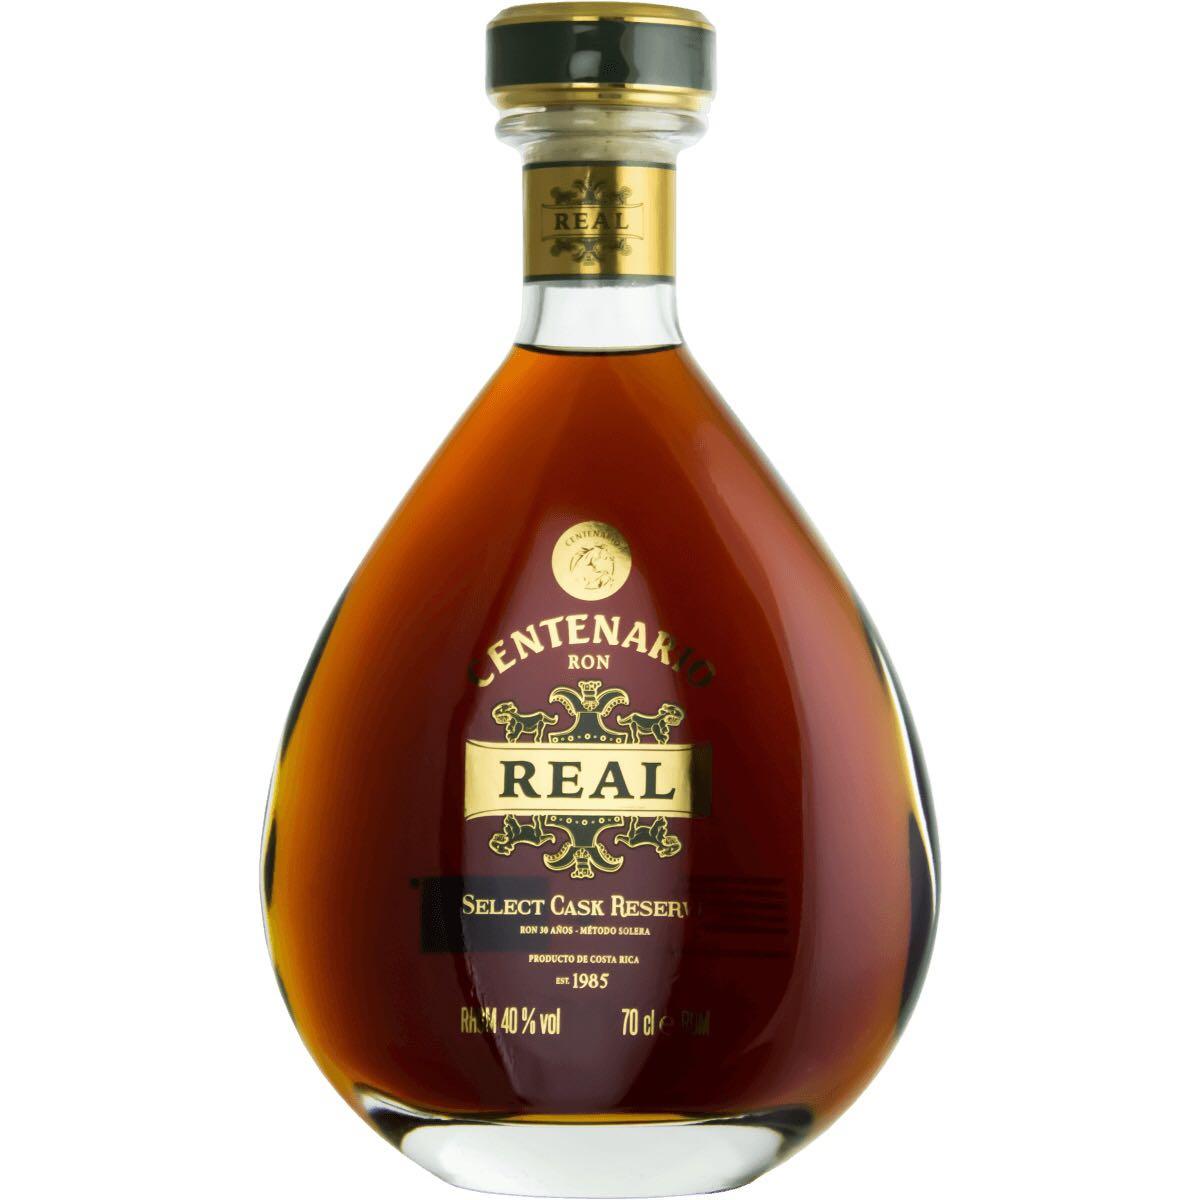 Bottle image of Centenario Real